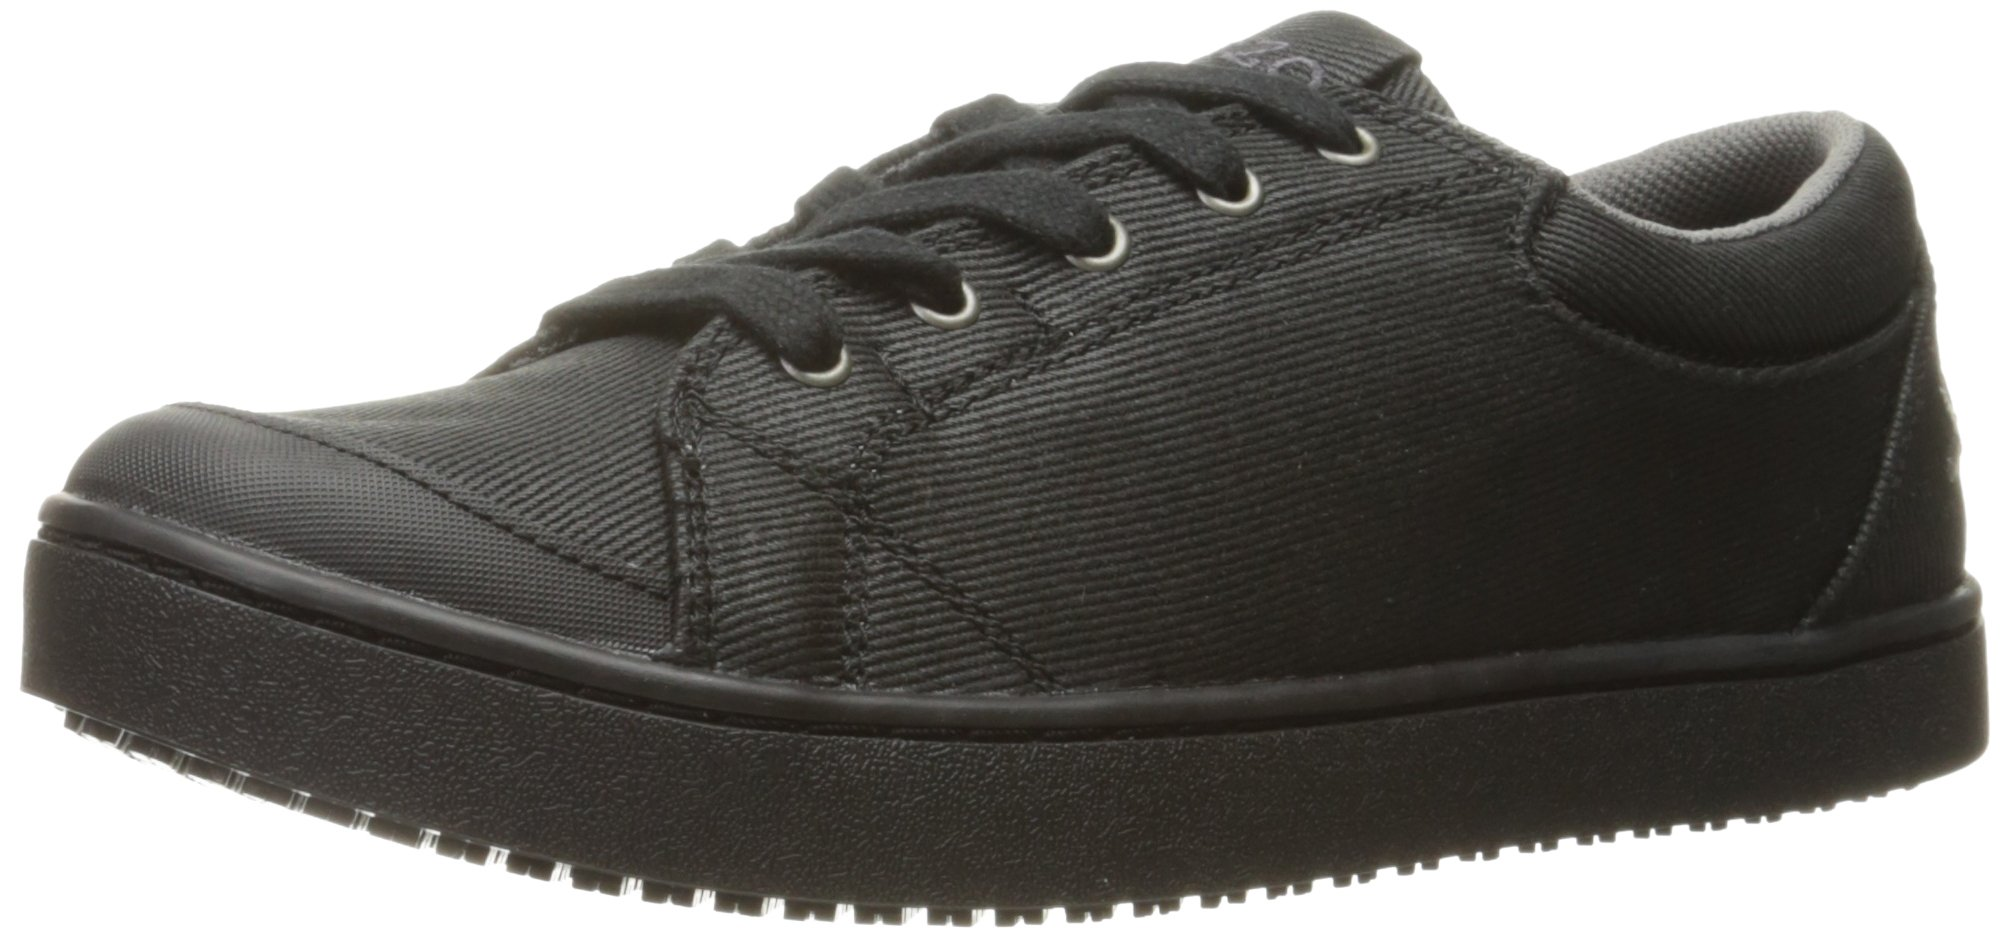 MOZO Women's Maven Food Service Shoe, Black, 8 B US by MOZO